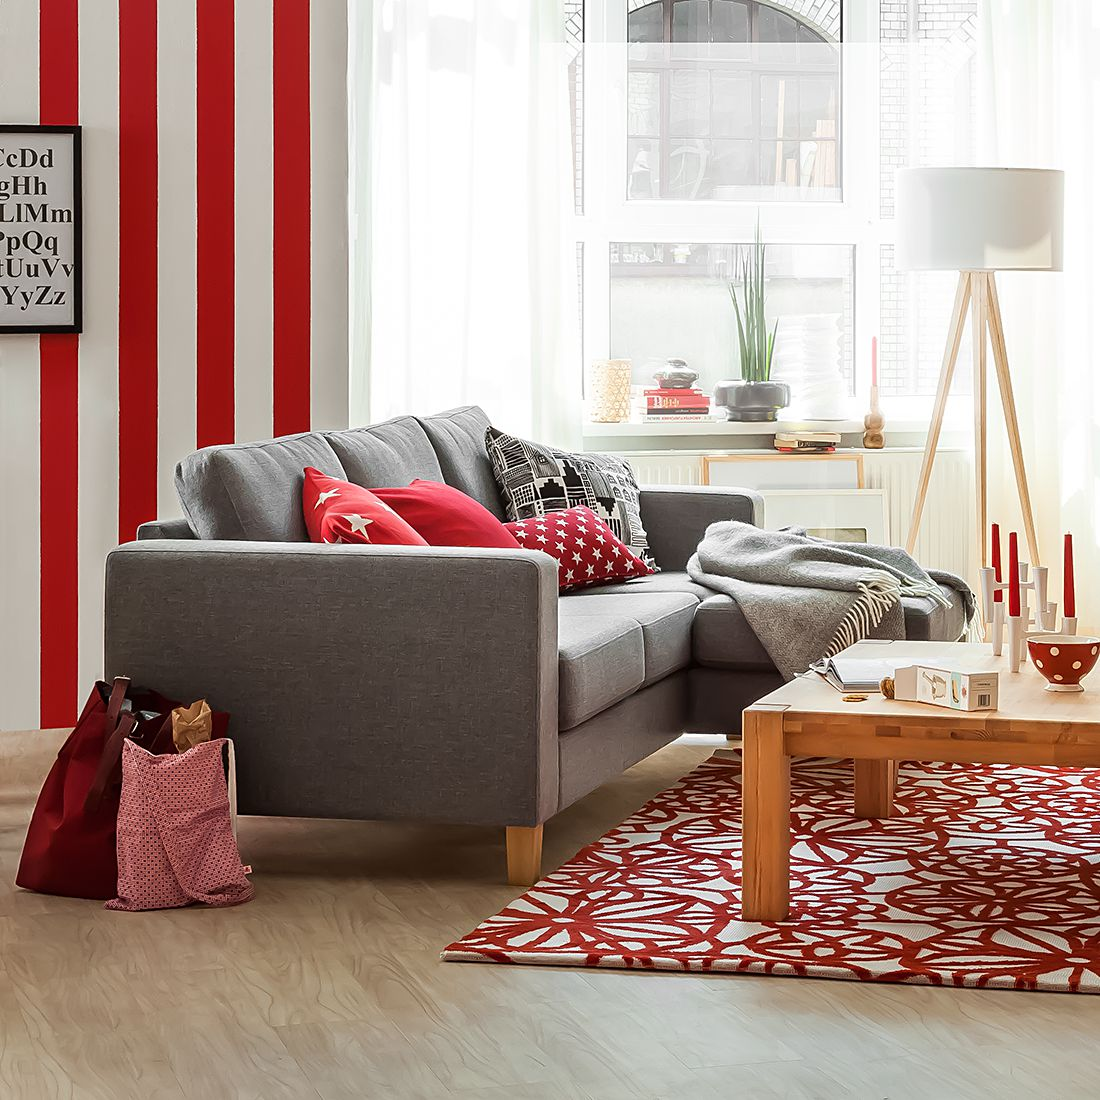 ecksofa weich elegant finest sofa sitzer links mit. Black Bedroom Furniture Sets. Home Design Ideas